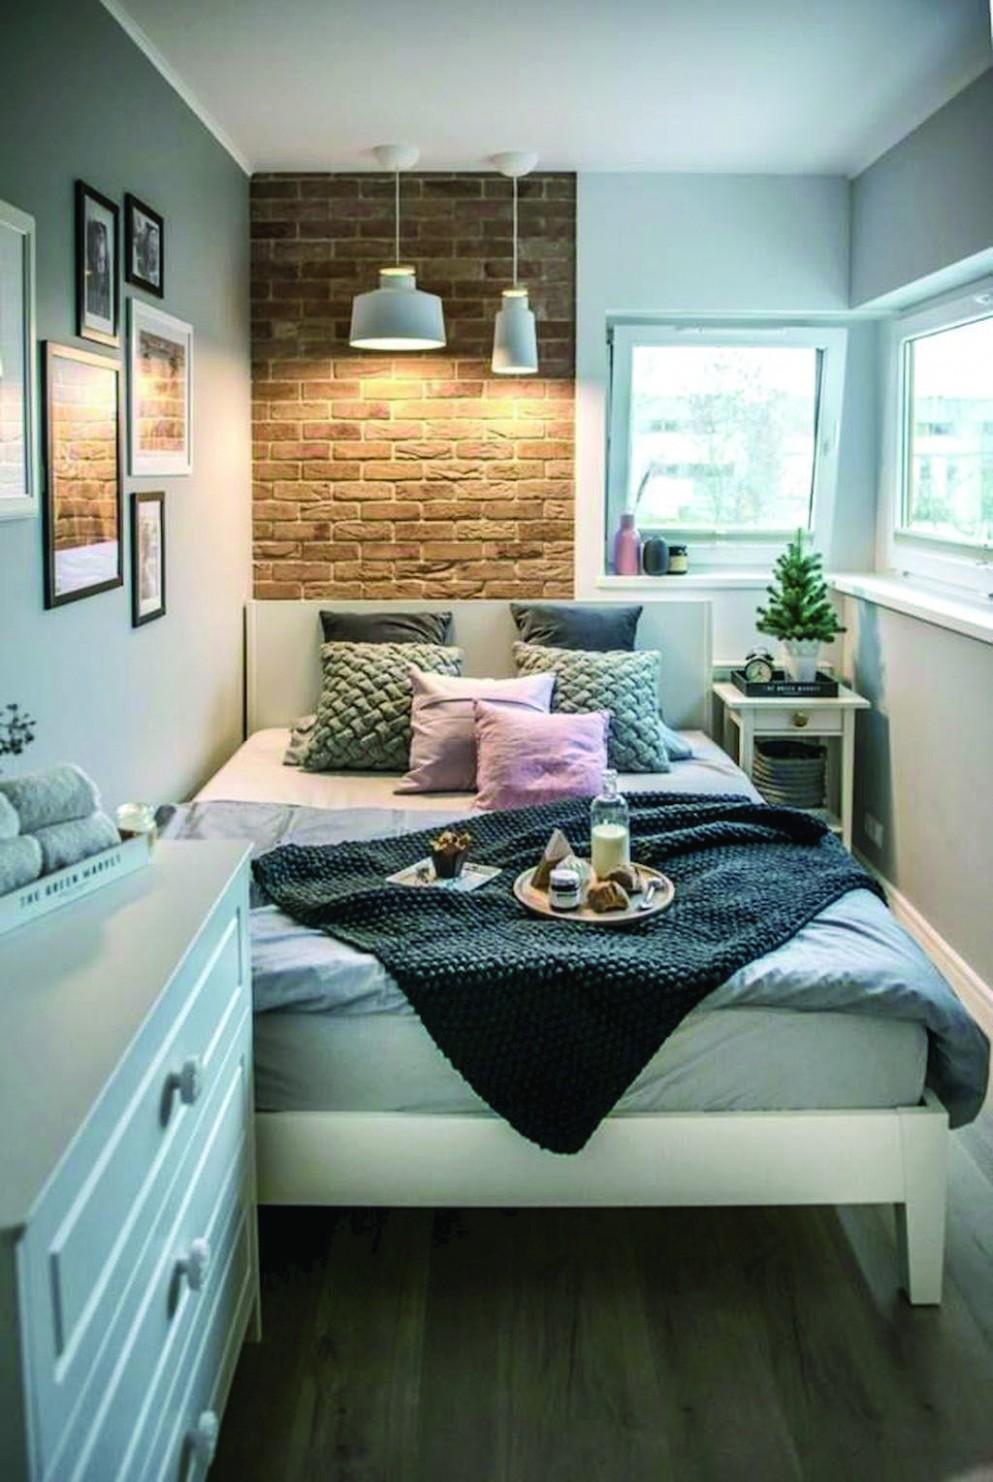 Fabulous apartment bedroom ideas pinterest for your home  Small  - Apartment Room Ideas Pinterest